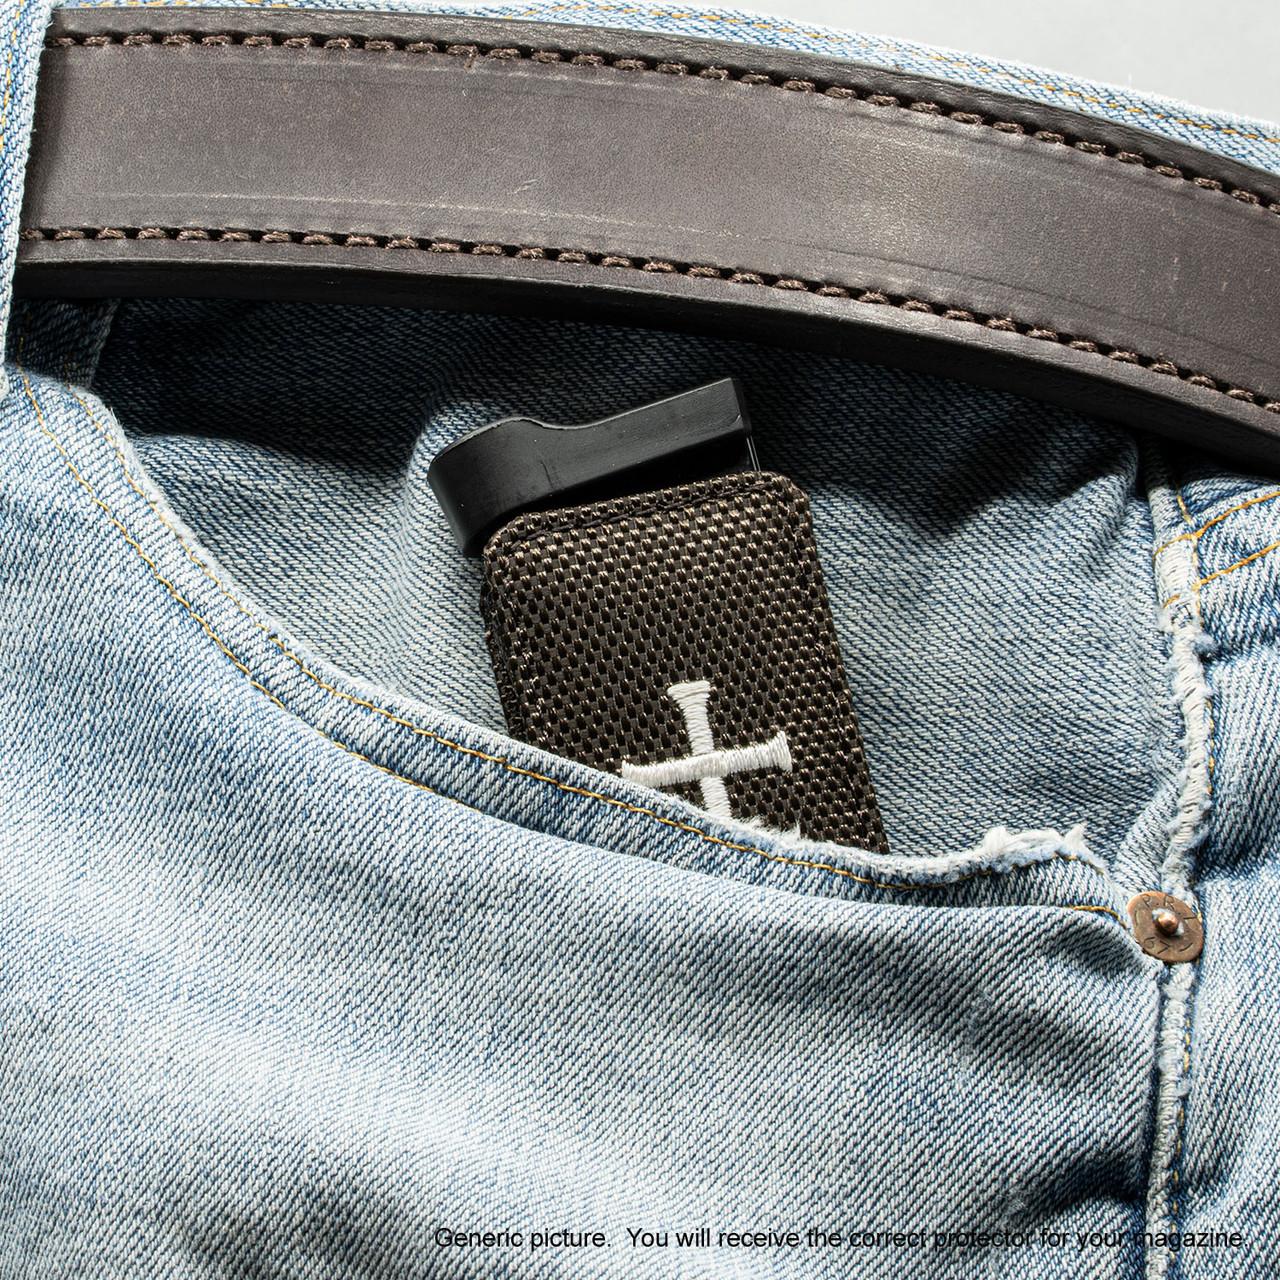 Sphinx SDP Compact Brown Cross Magazine Pocket Protector